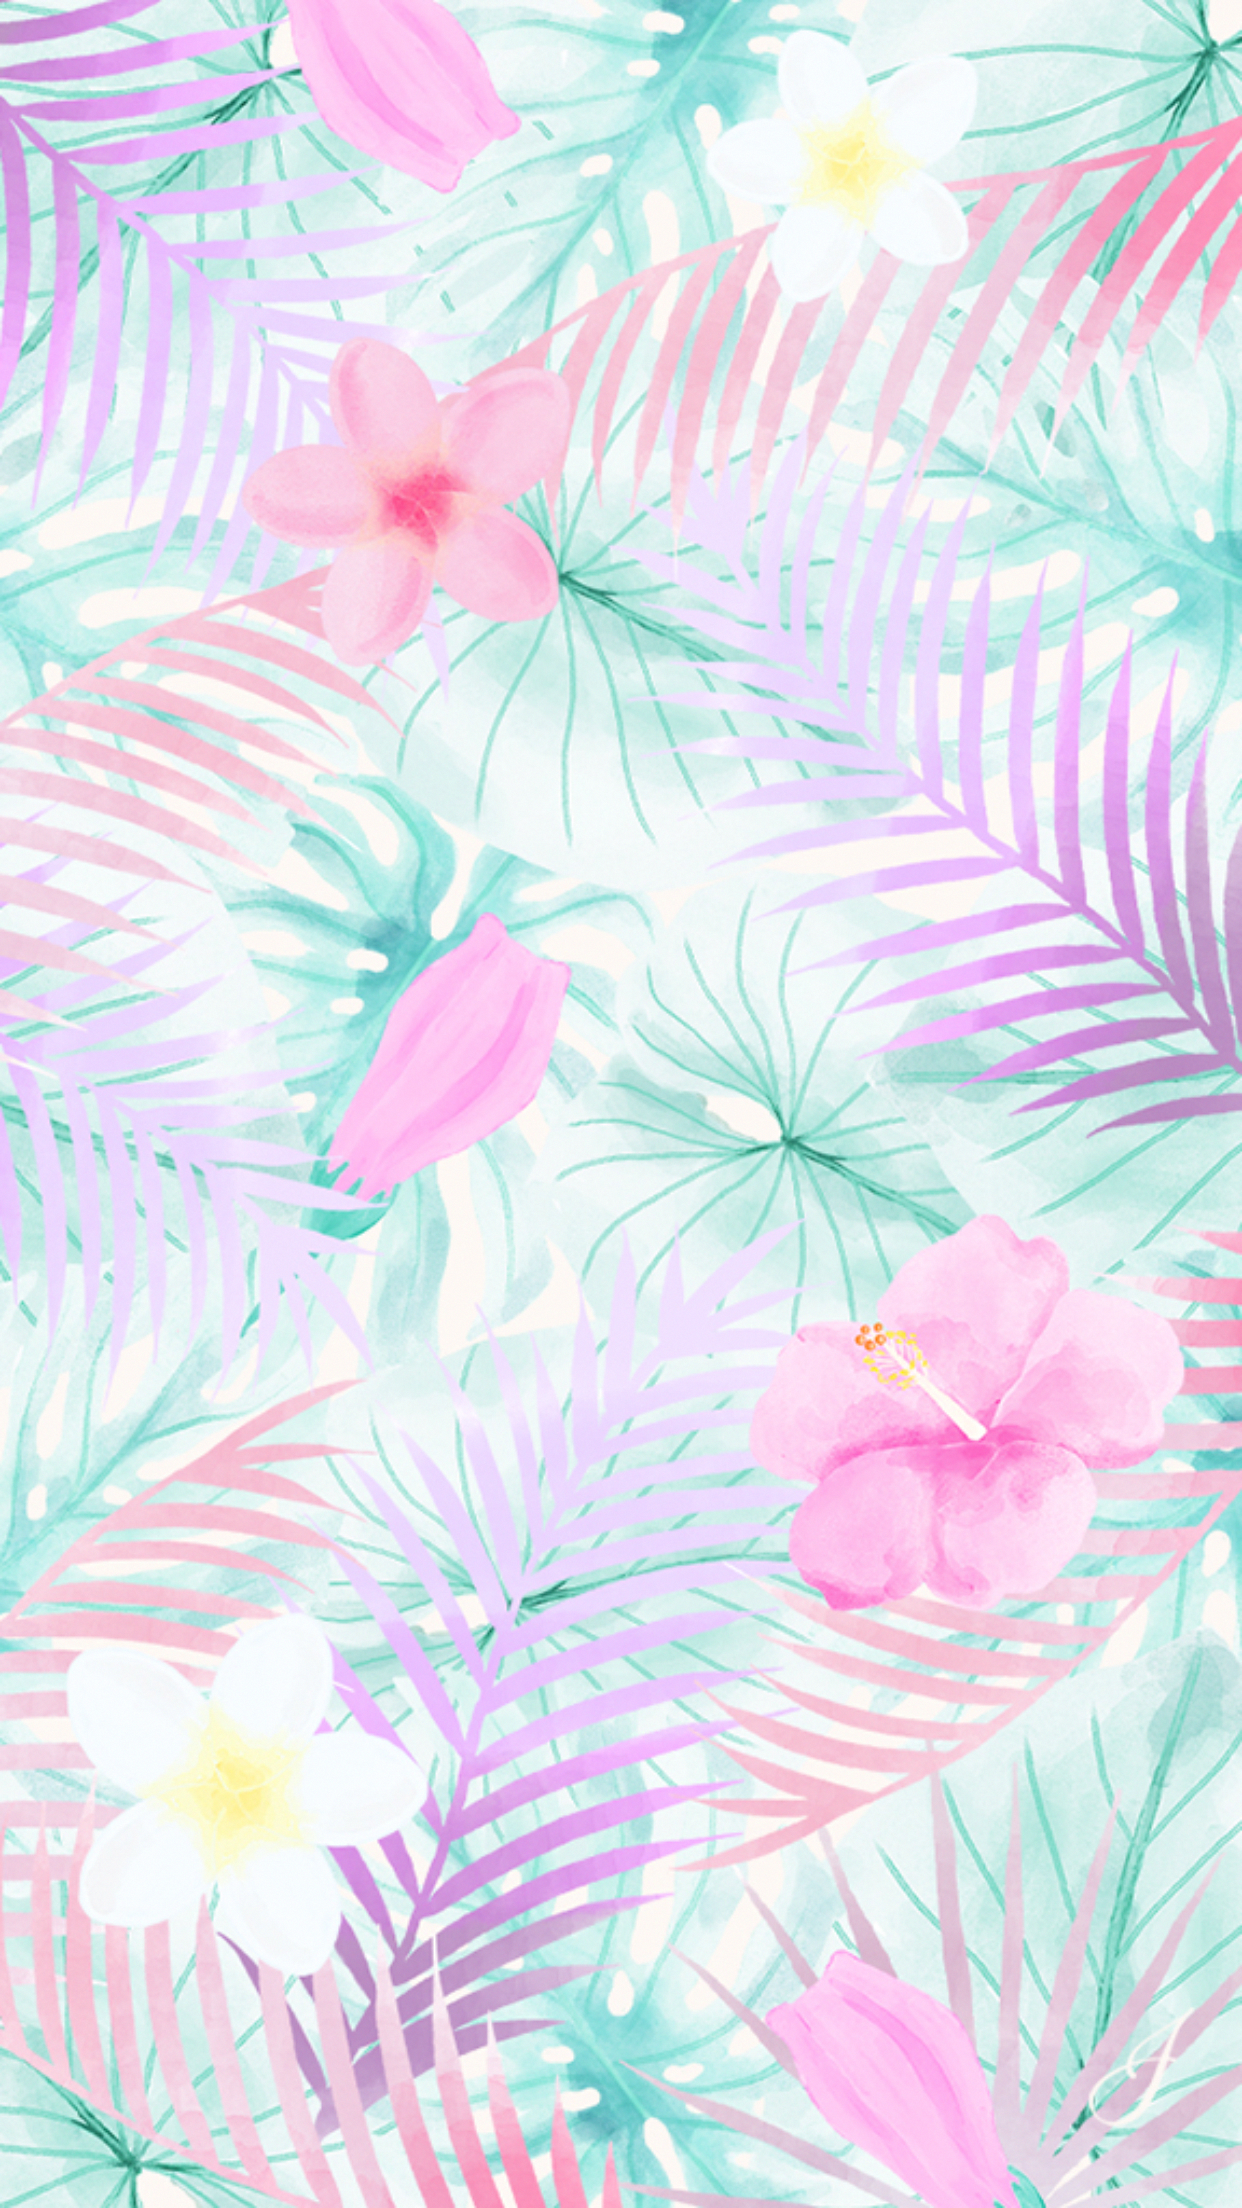 Cute Wallpaper For Summer Flowerswallpaperiphone Wallpaper Iphone Cute Wallpaper Iphone Summer Pretty Wallpapers